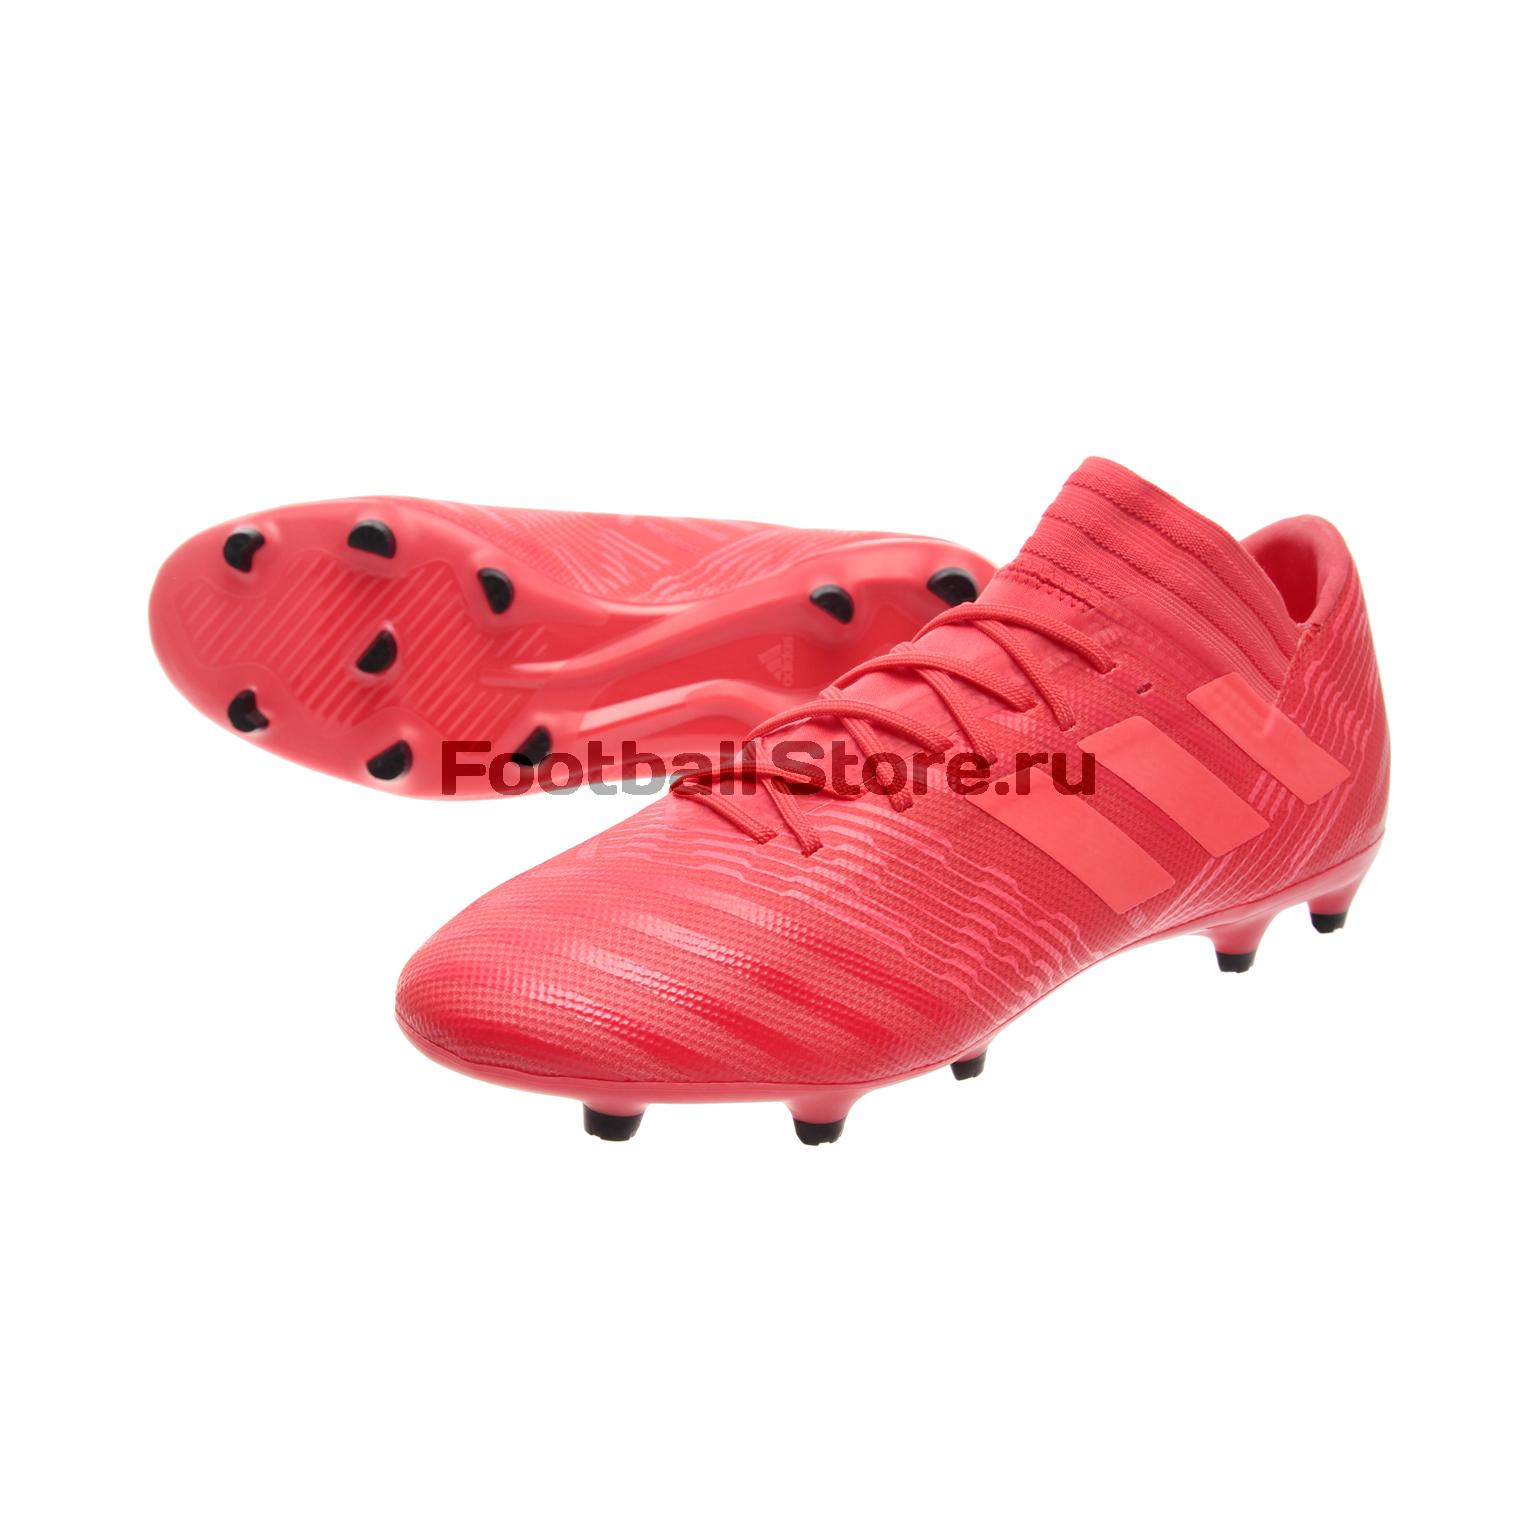 Бутсы Adidas Nemeziz 17.3 FG CP8987 бутсы adidas messi 16 2 fg aq3111